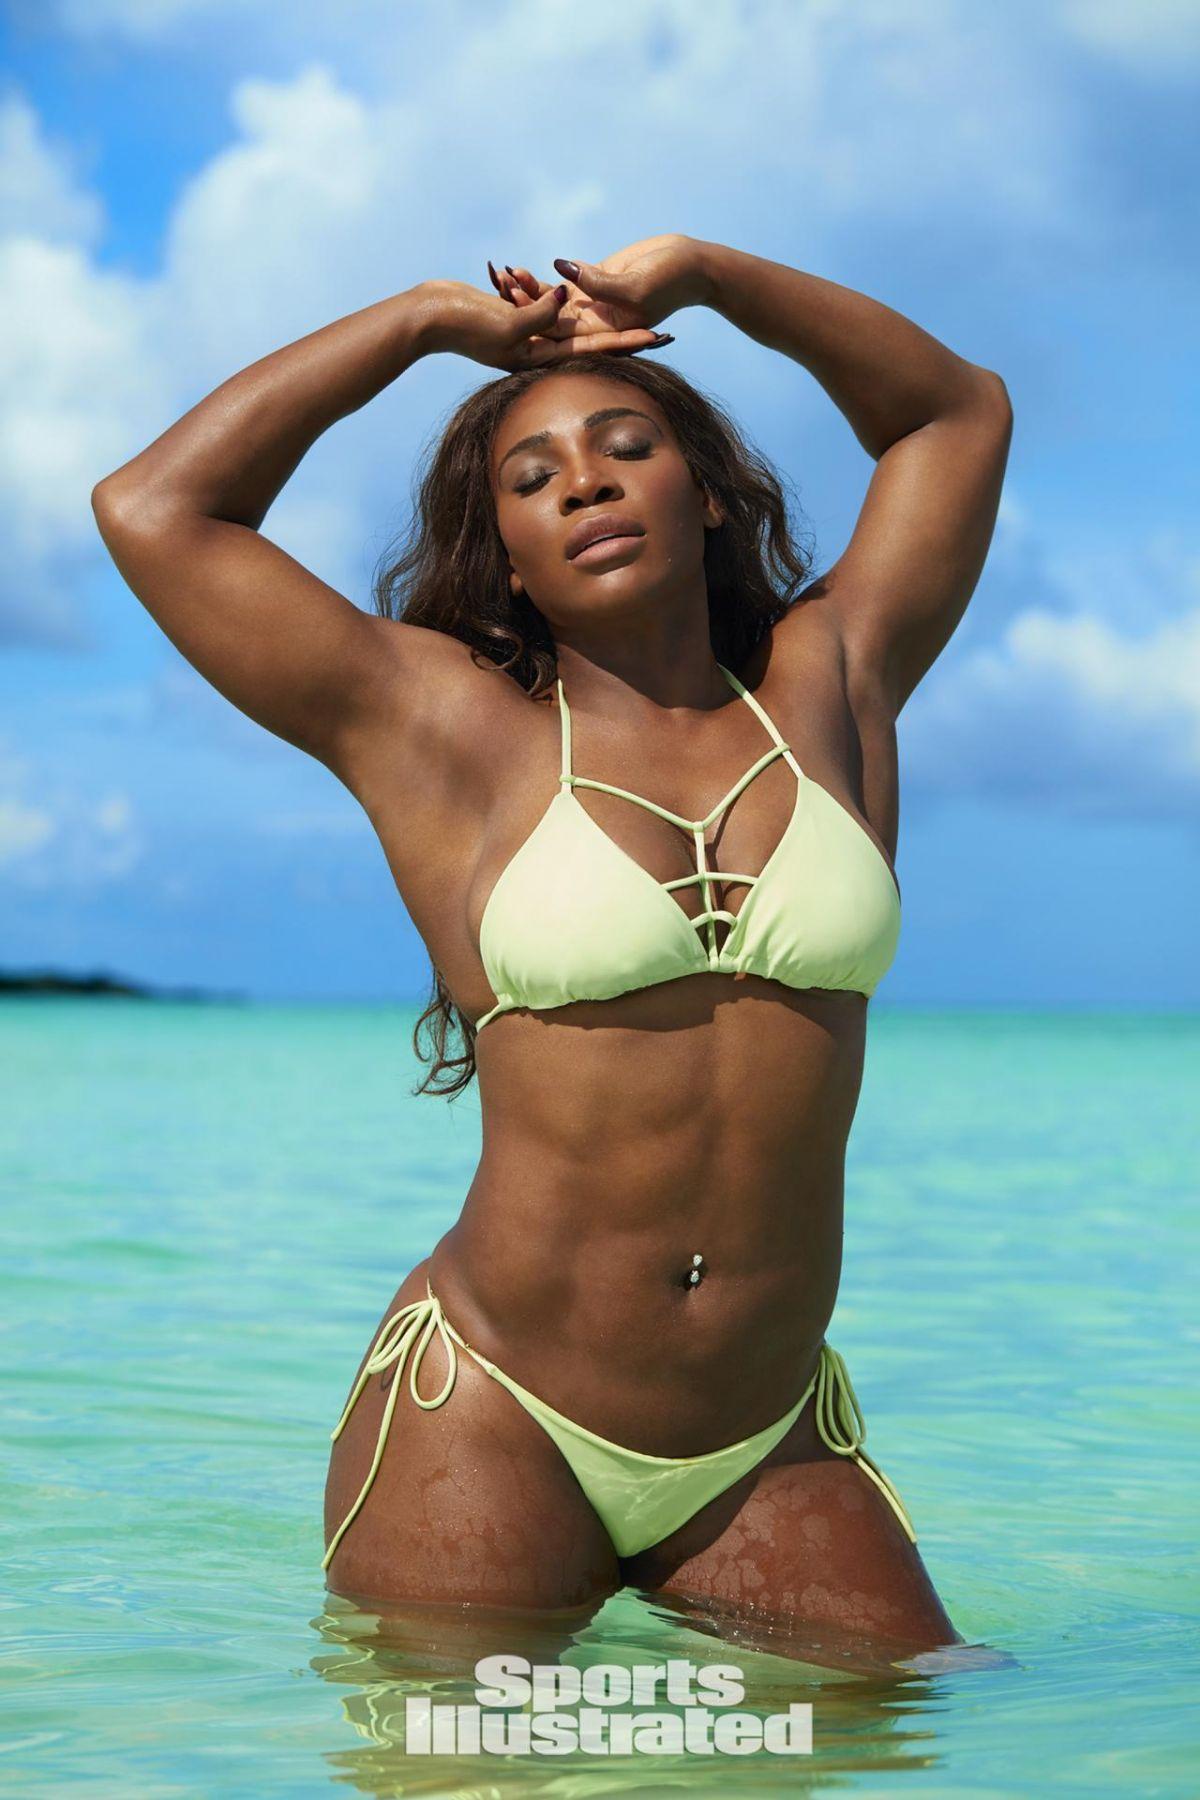 Serena Williams - News-berblick - Bildde